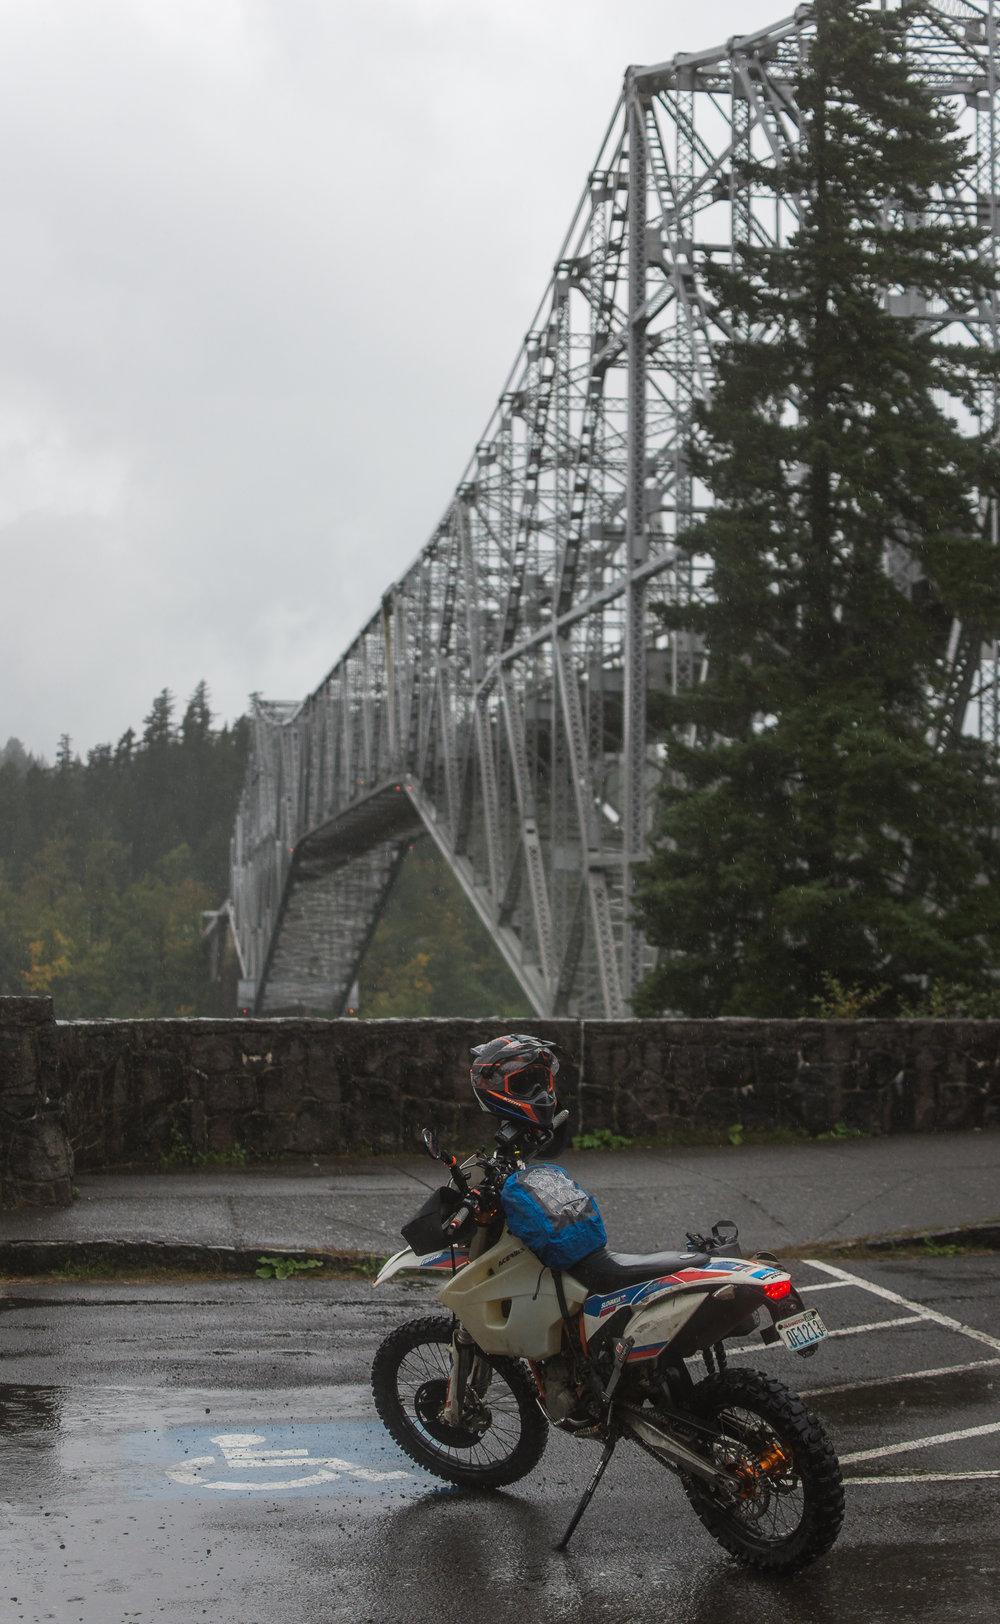 45.661741, -121.898484 . Bridge of the Gods, Oregon side.